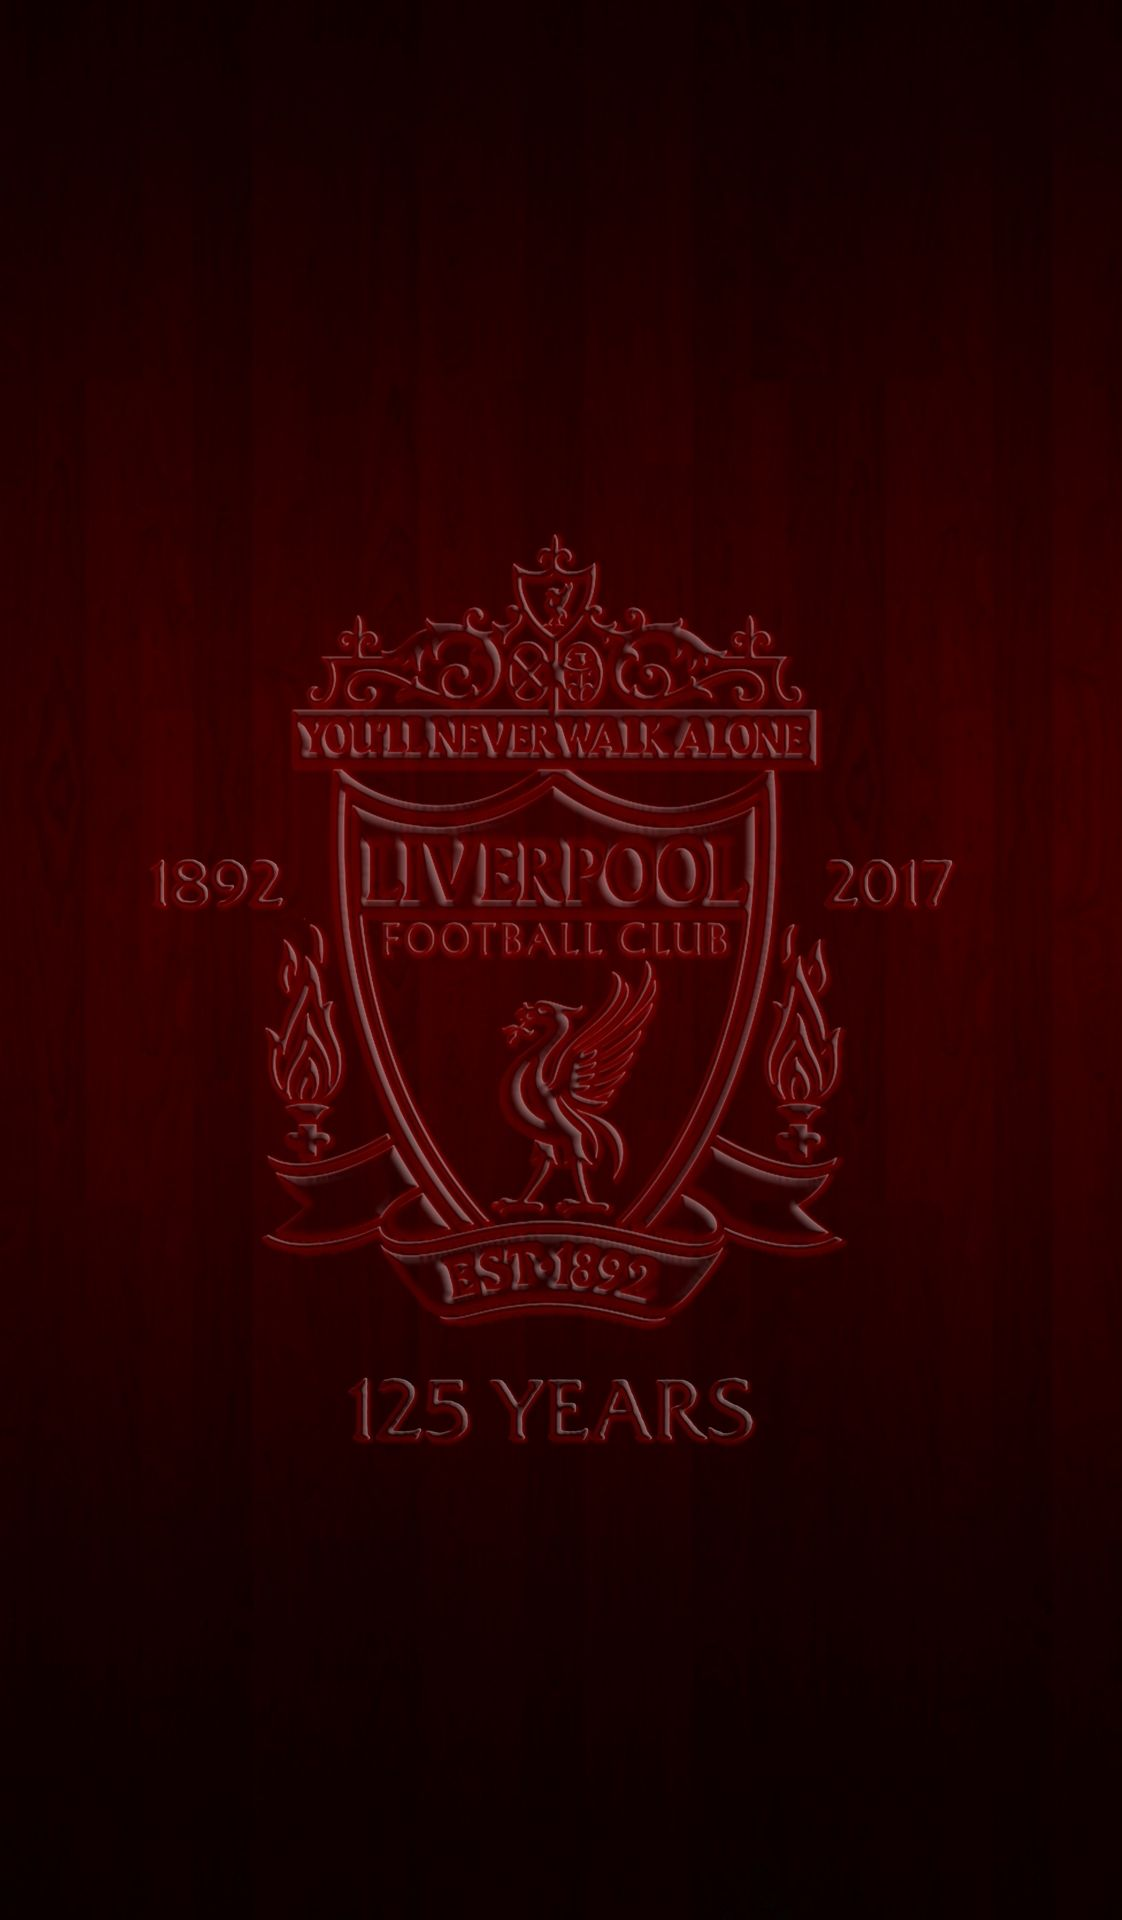 Logo Terbaru Liverpool Fc